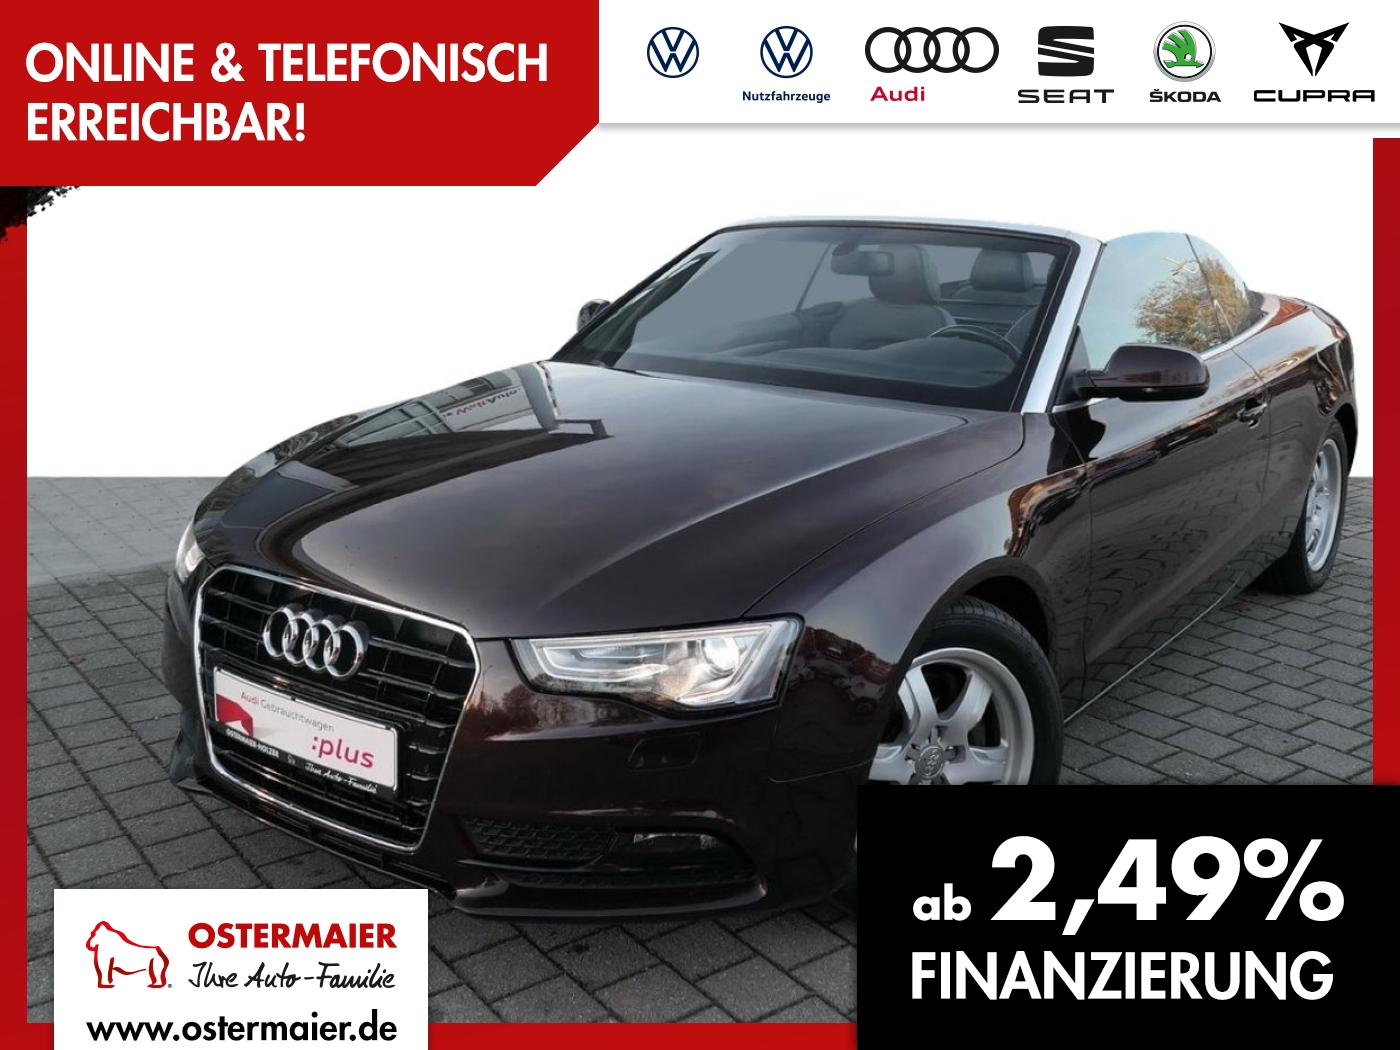 Audi A5 Cabriolet 2.0TFSI 211PS NAVI.ALCANTARA.SHZG.X, Jahr 2012, Benzin